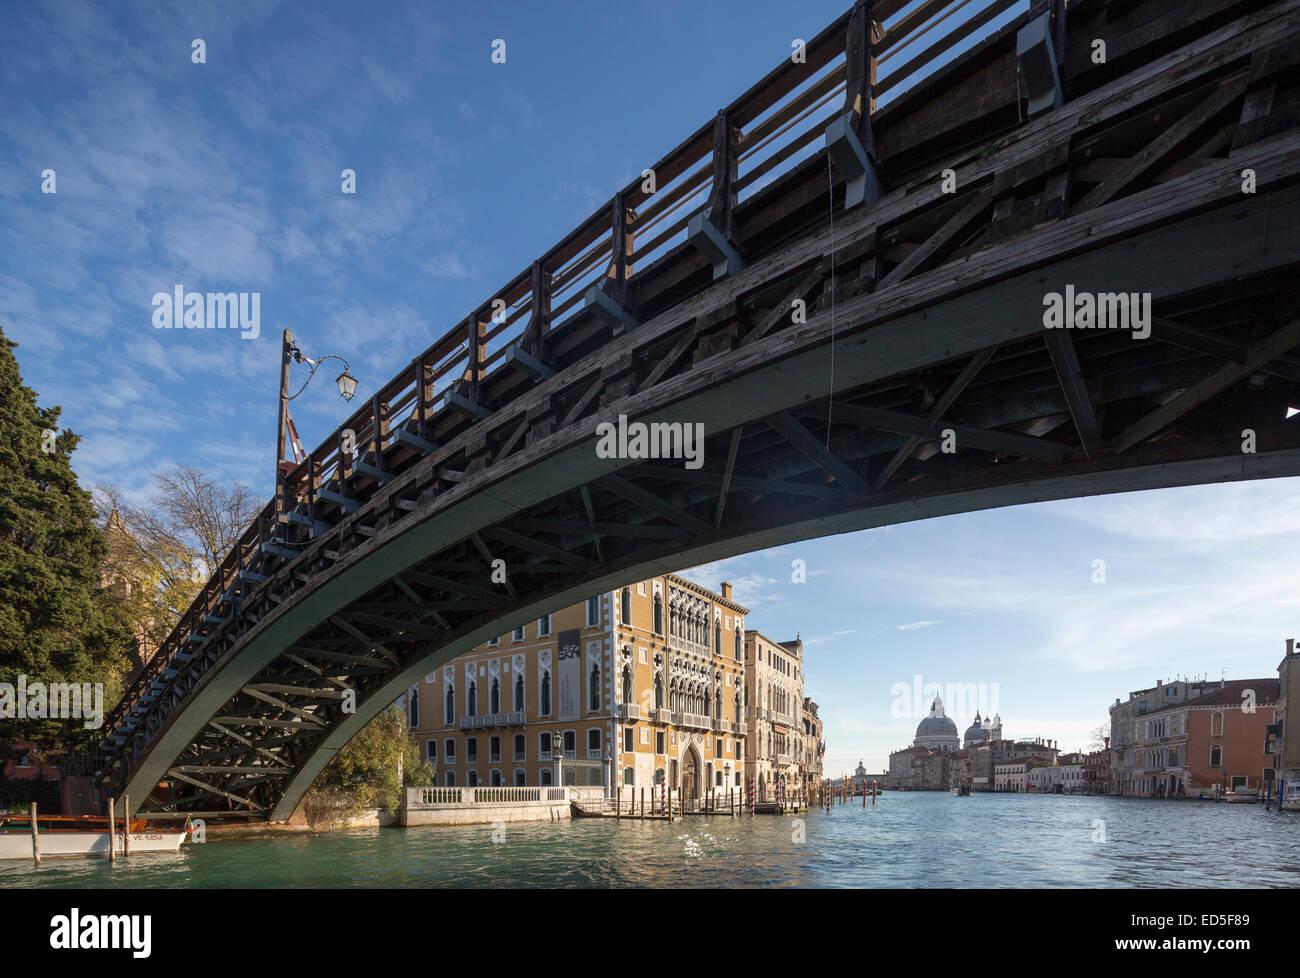 Accademia Bridge, Ponte dell'Accademia and Grand Canal, Venice, Italy - Stock Image